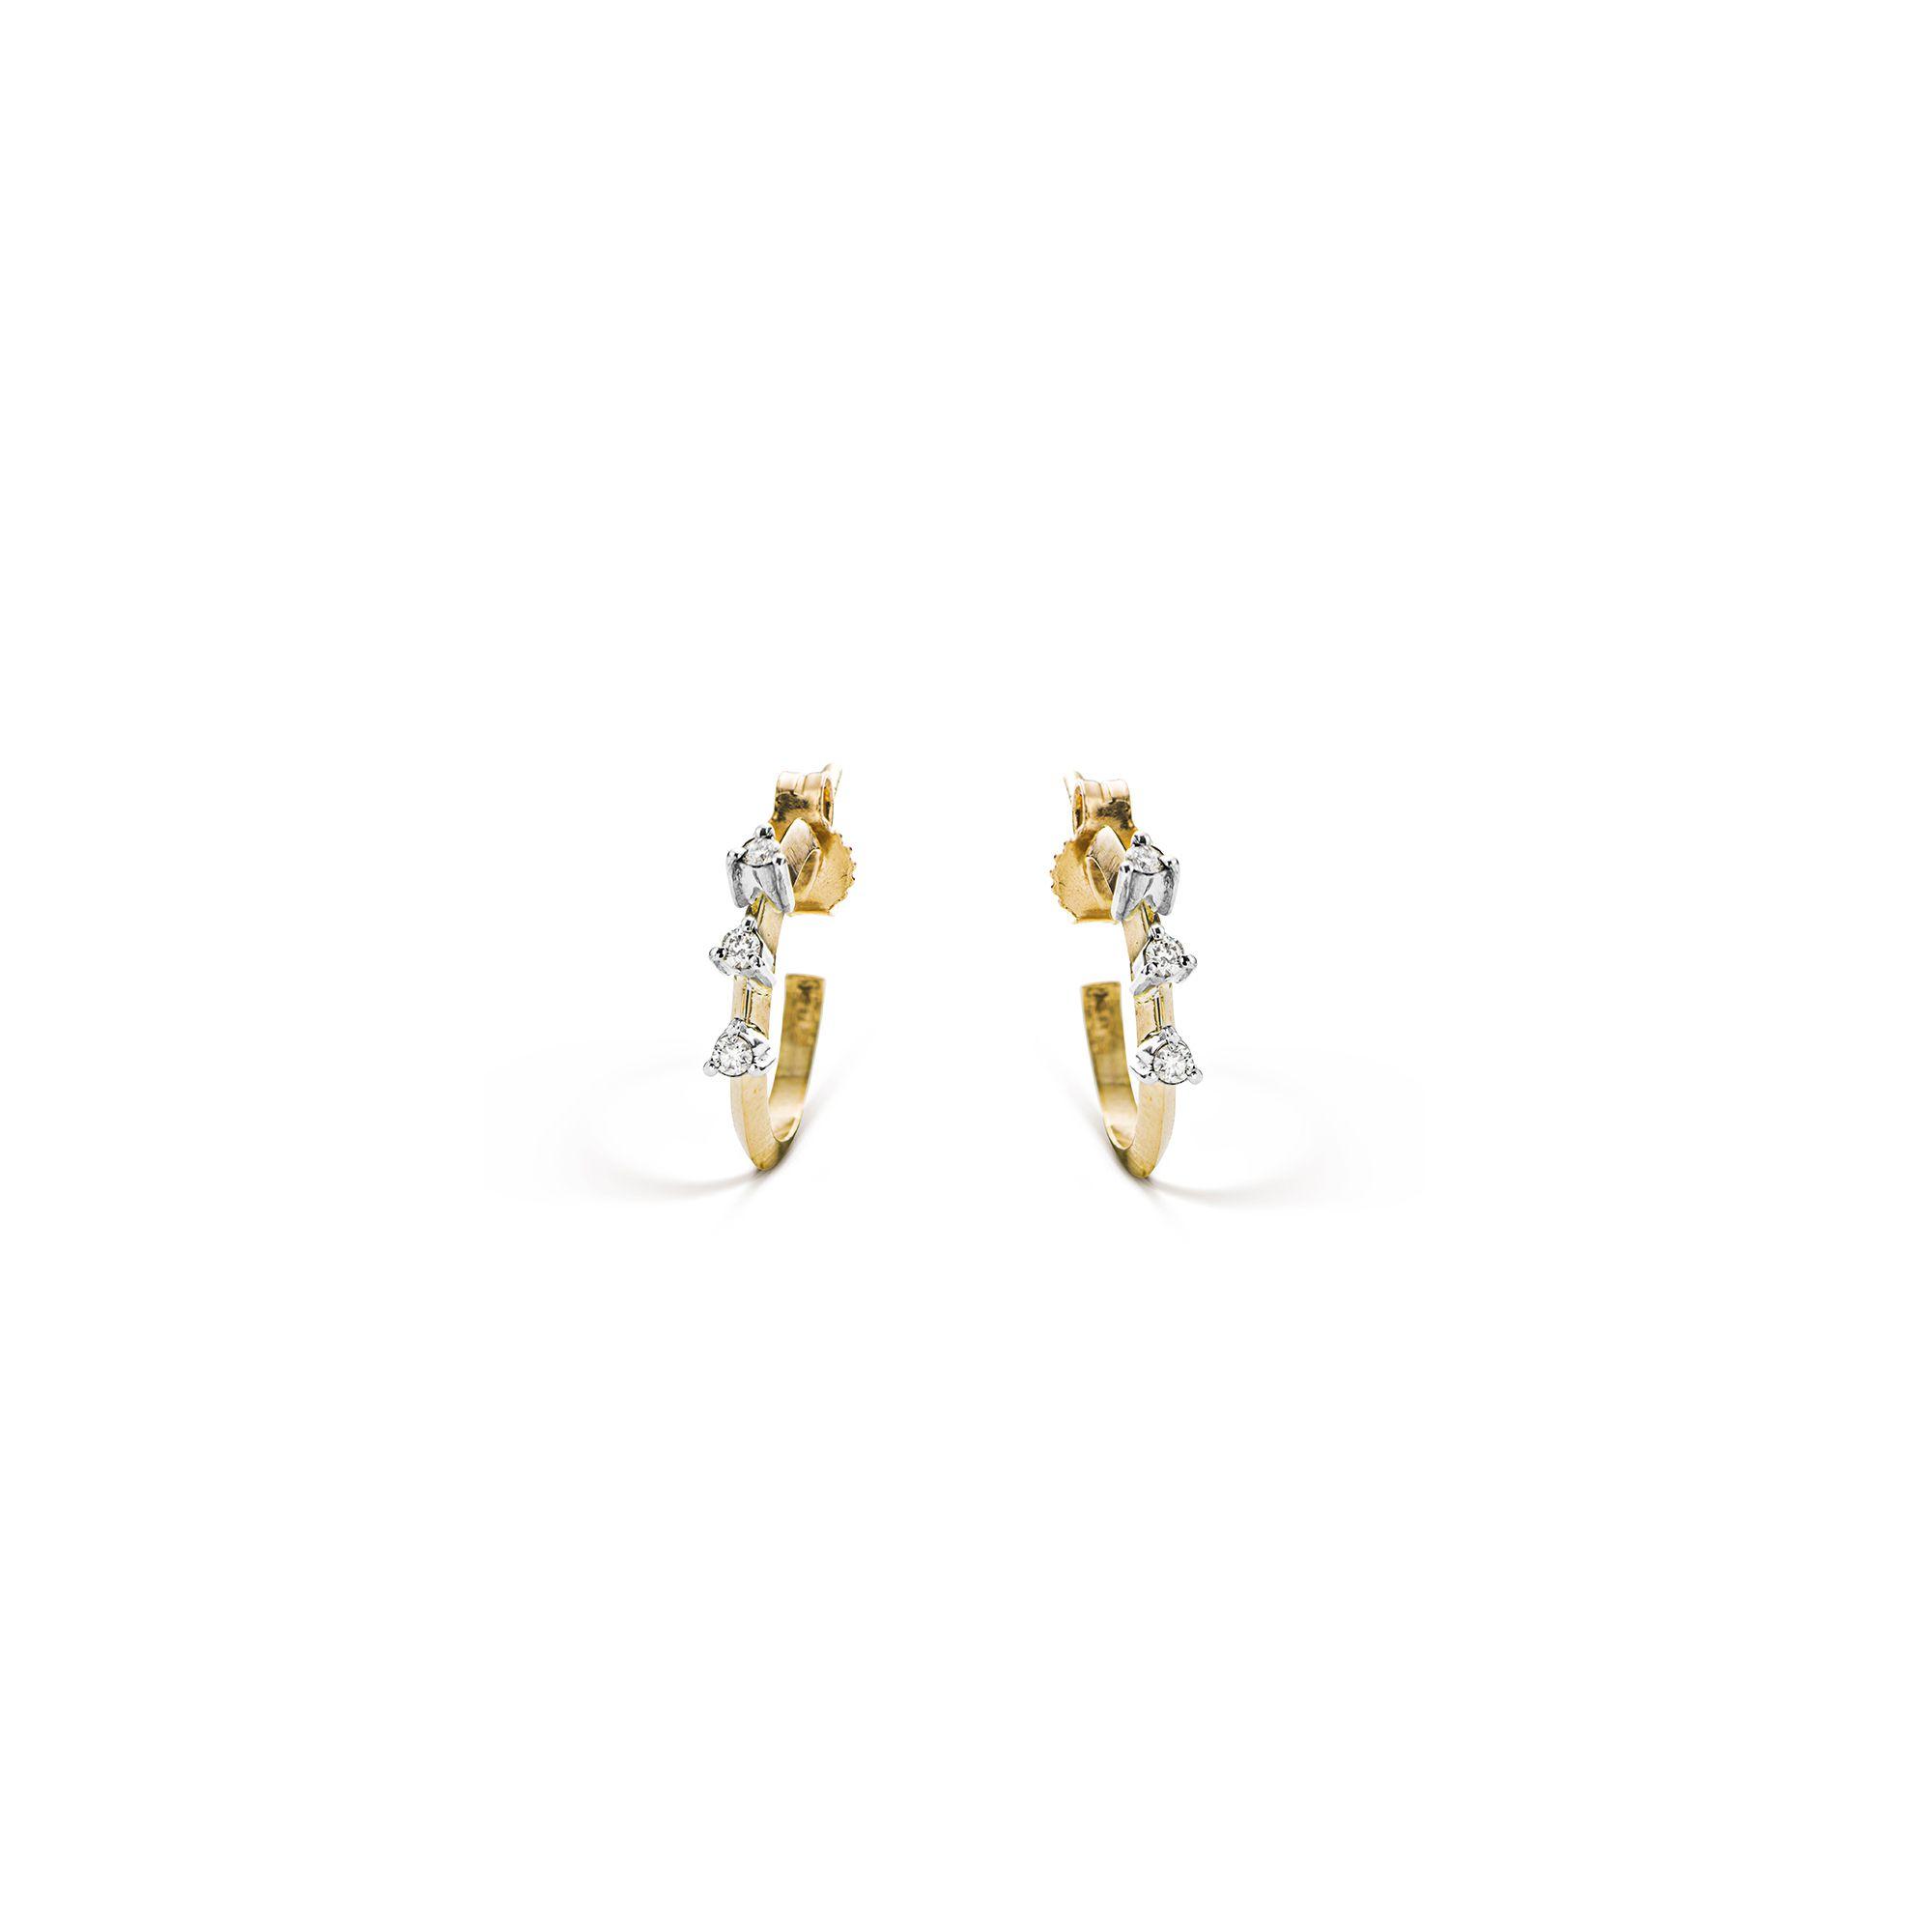 Yellow gold 'Balance' small hoop earrings Gold hoop earrings with diamonds